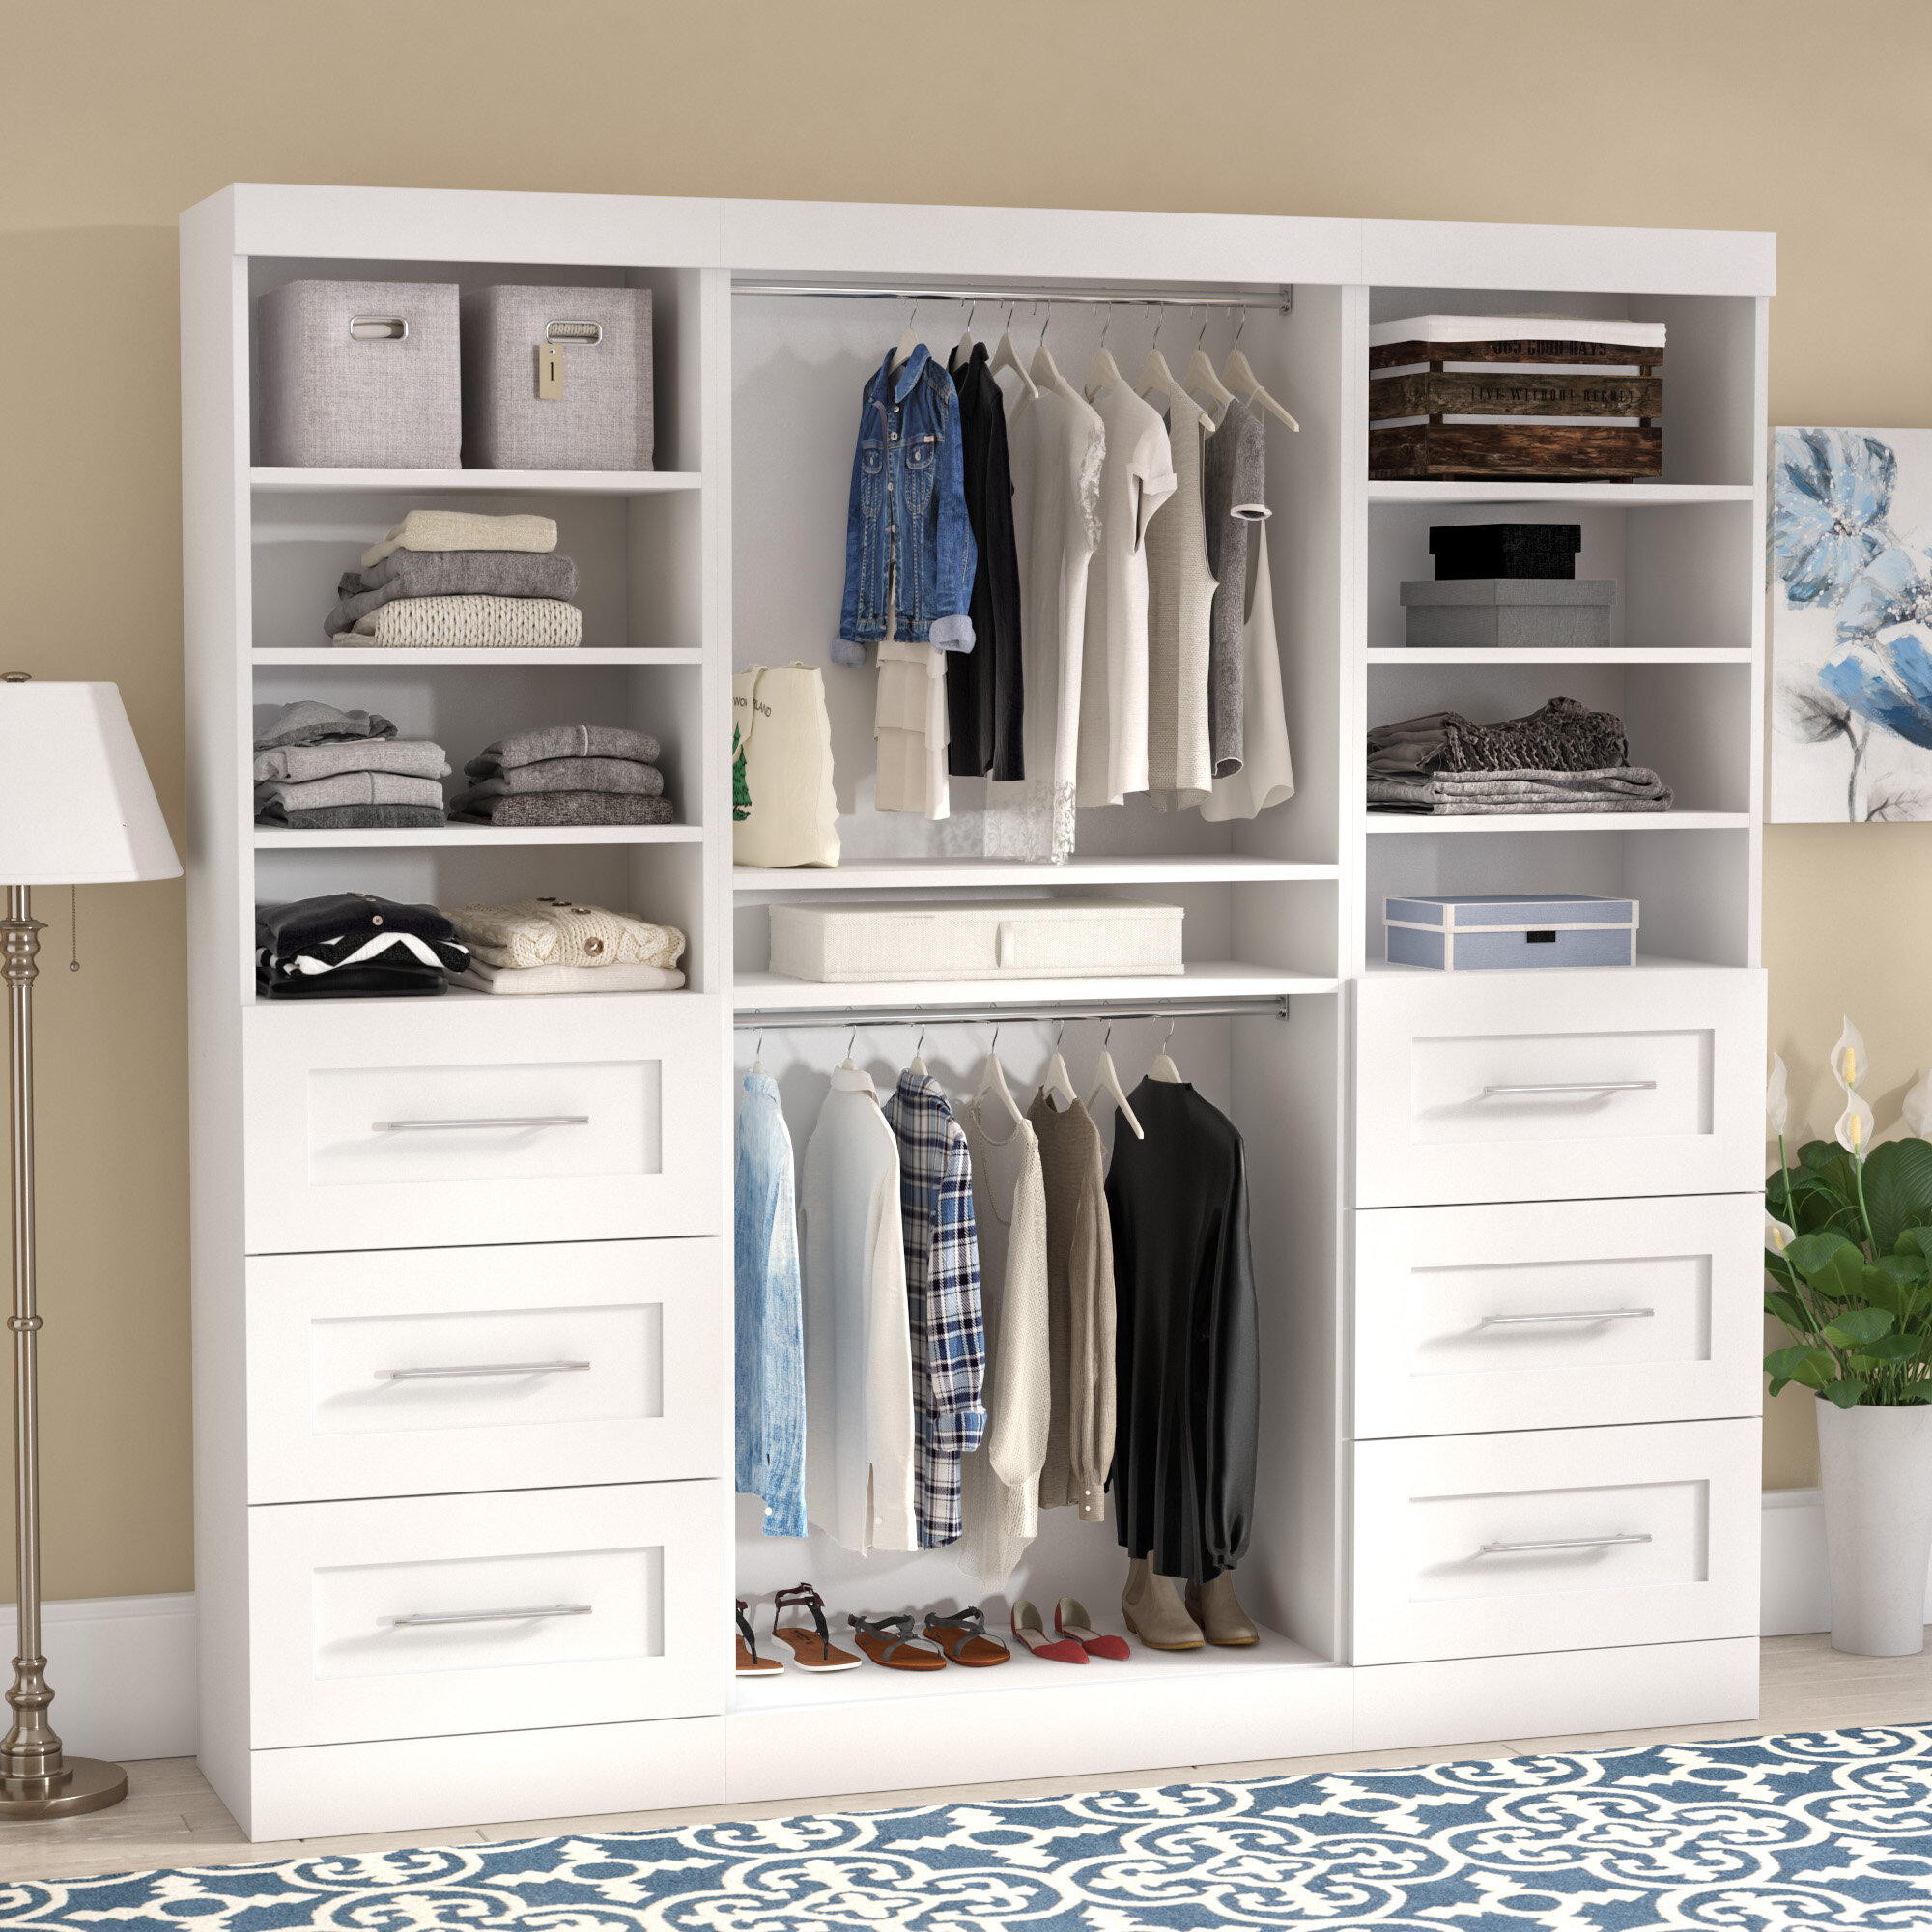 Navarro 85 8 W Closet System